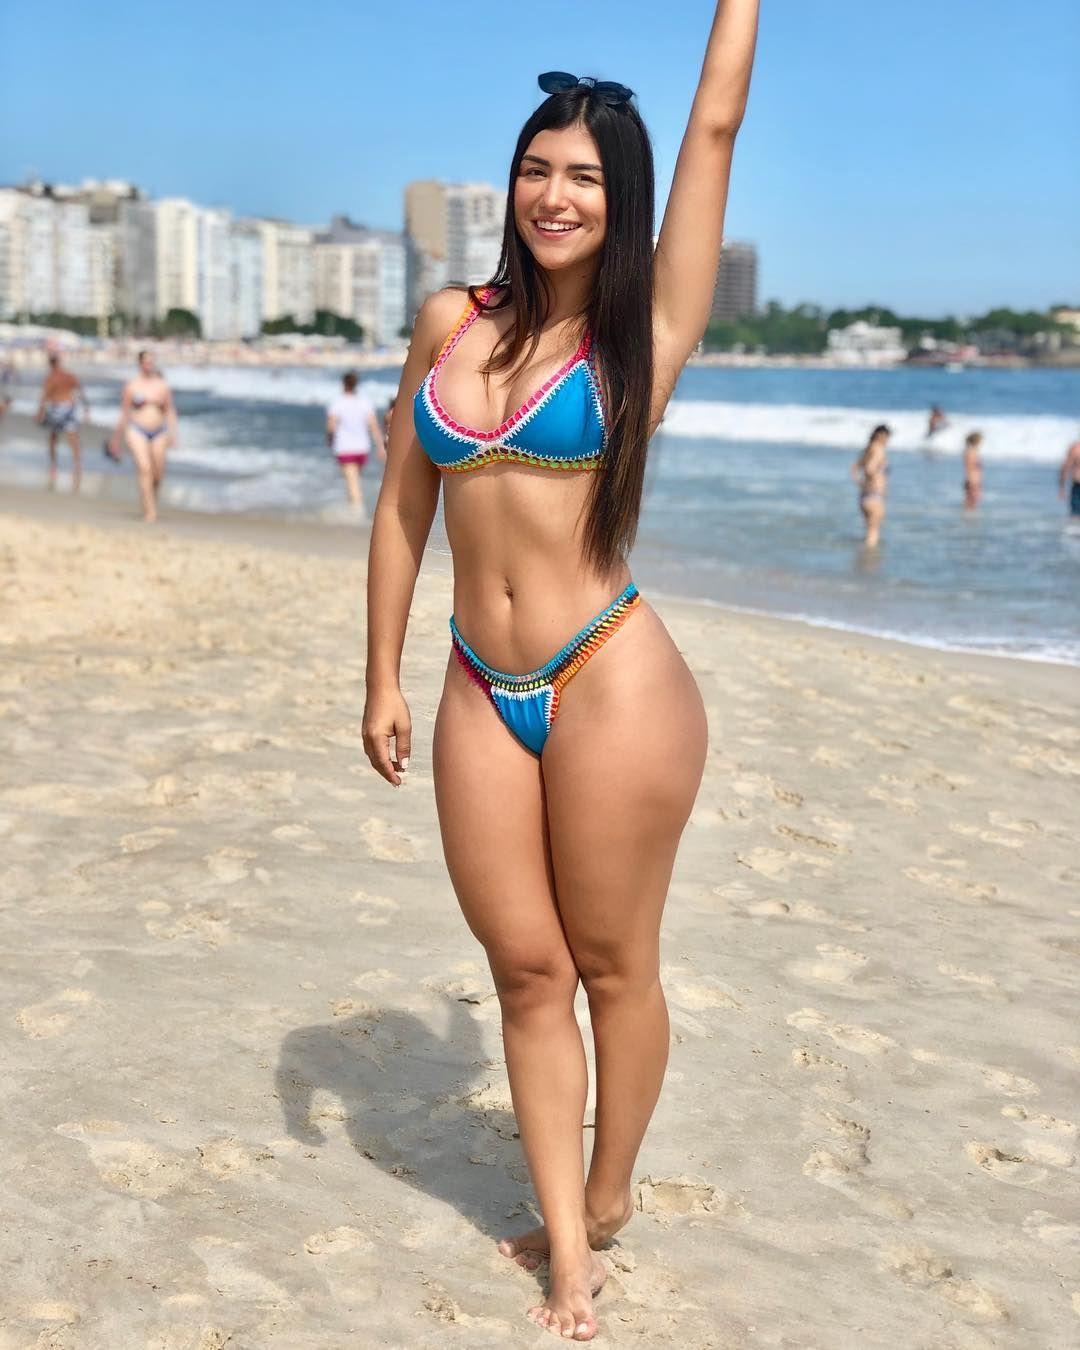 Bikini car wash compaqny